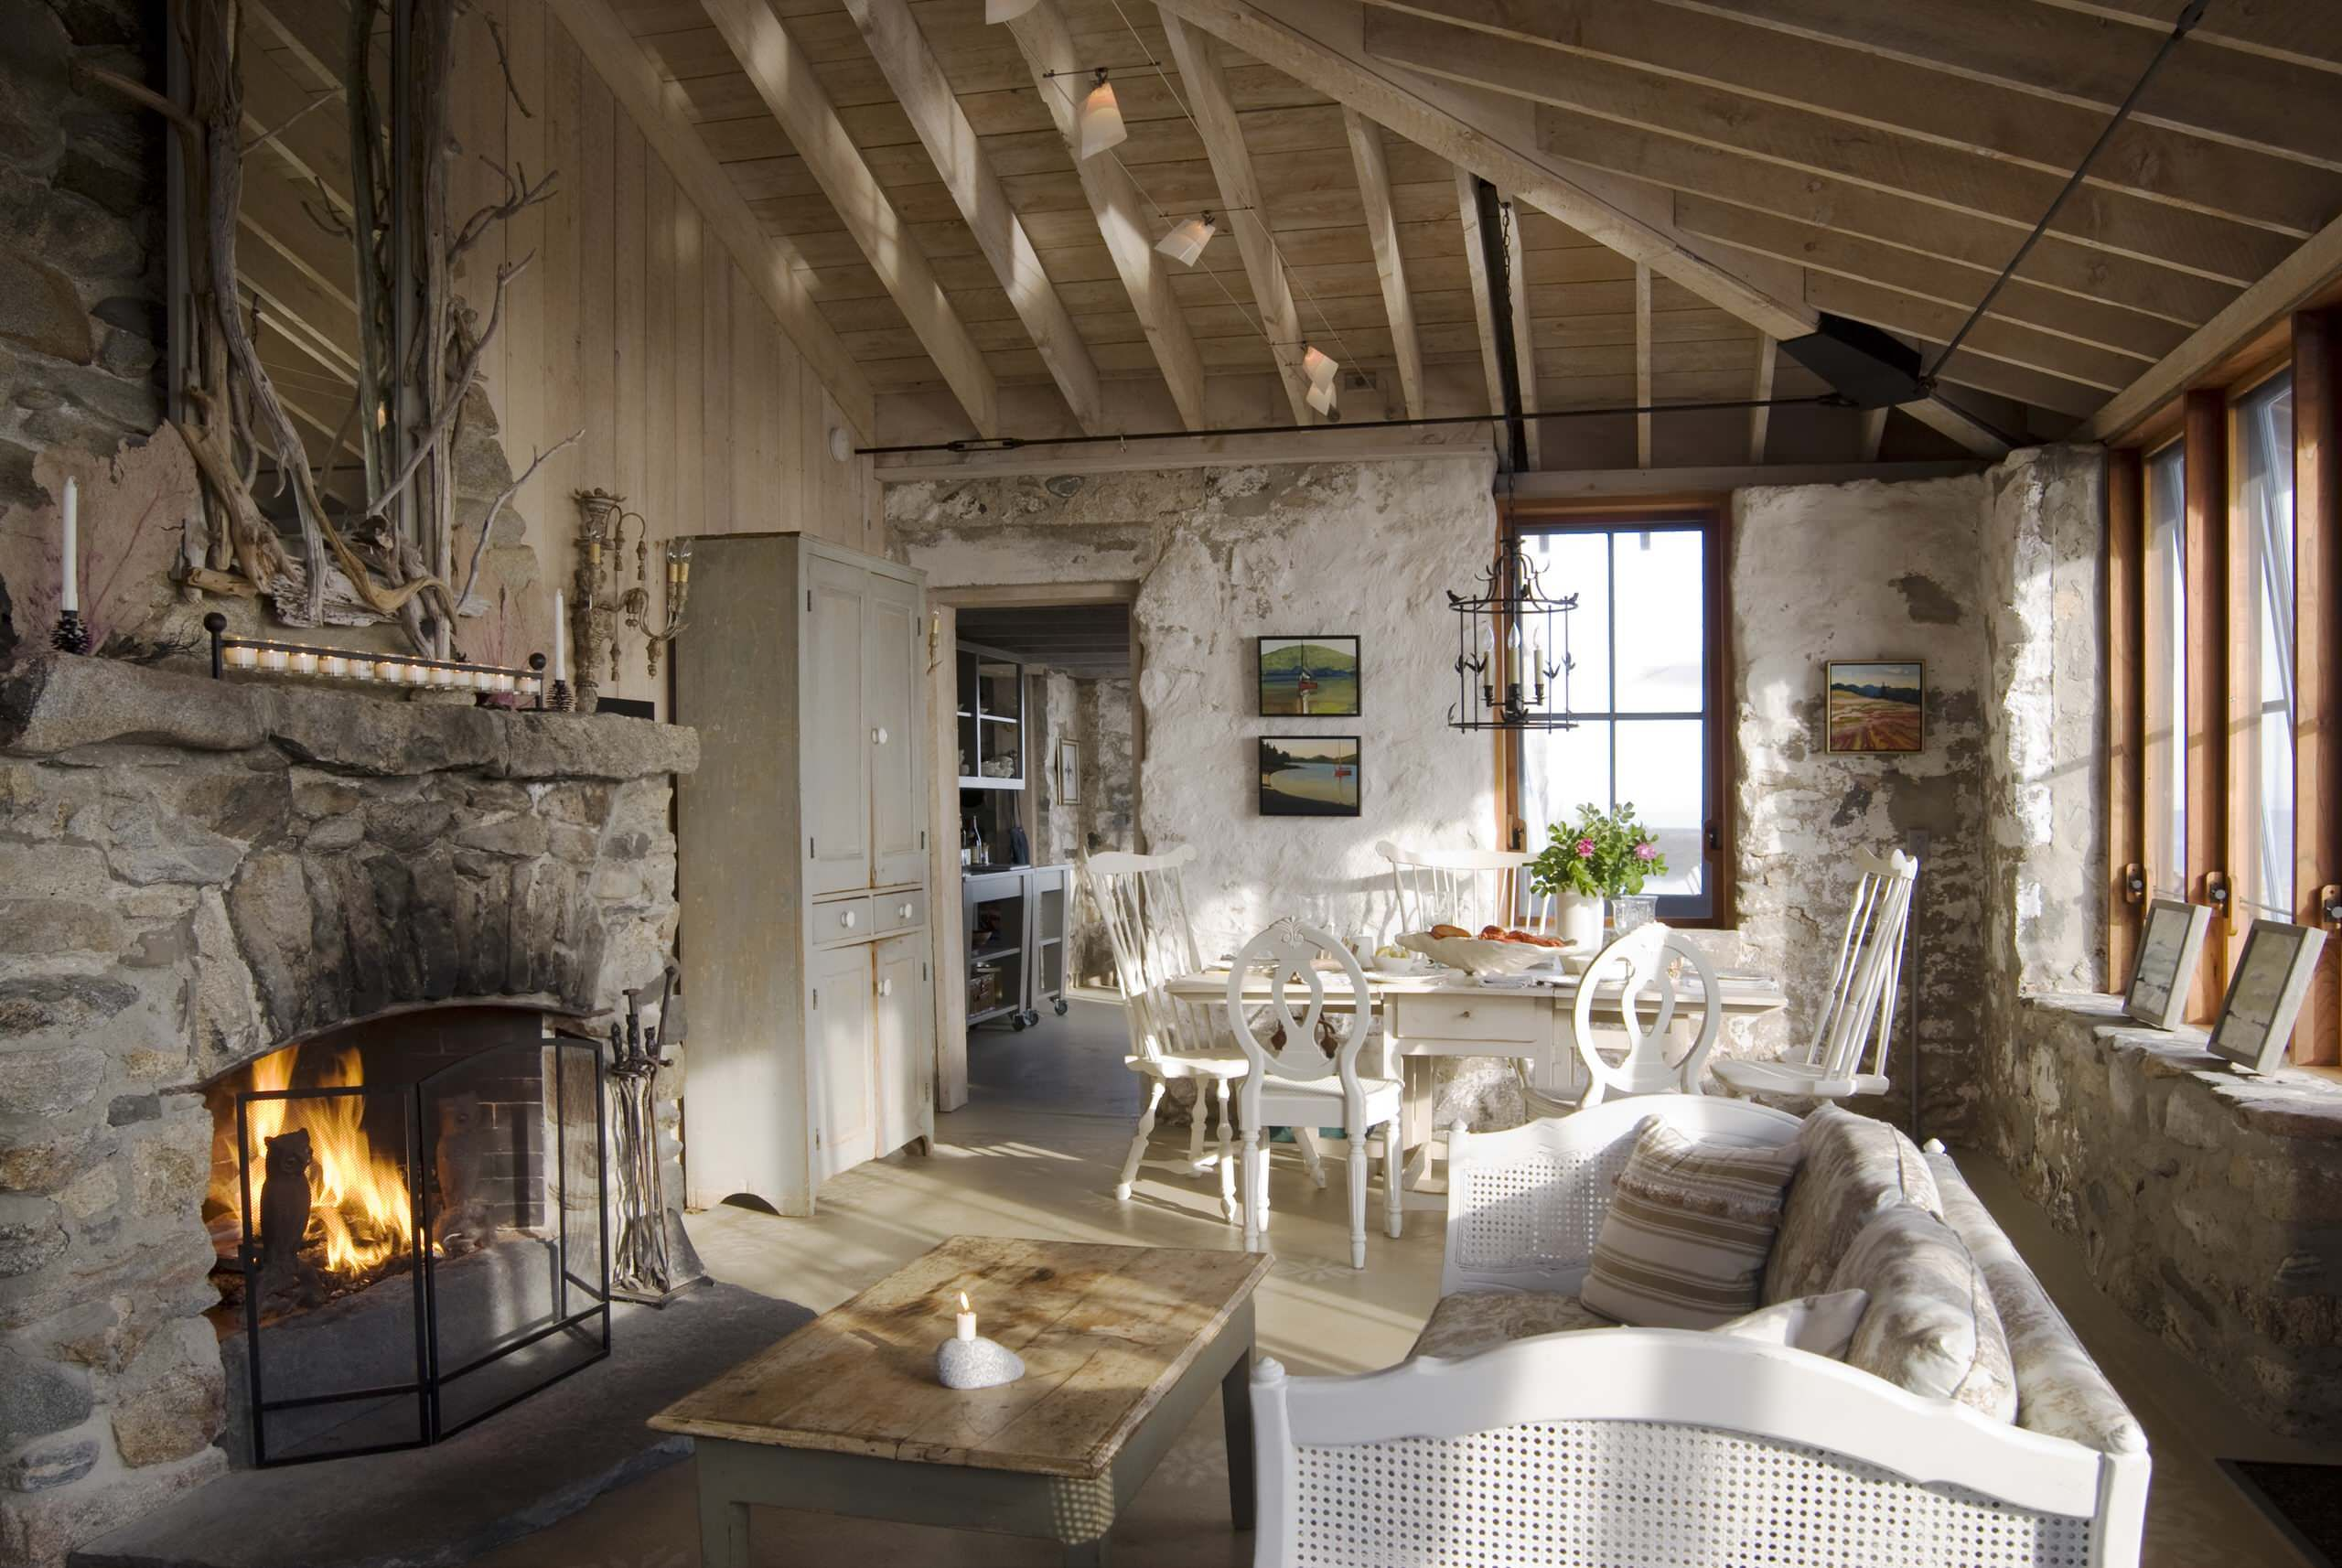 8 Beautiful Rustic Country Farmhouse Decor Ideas Cottage Living